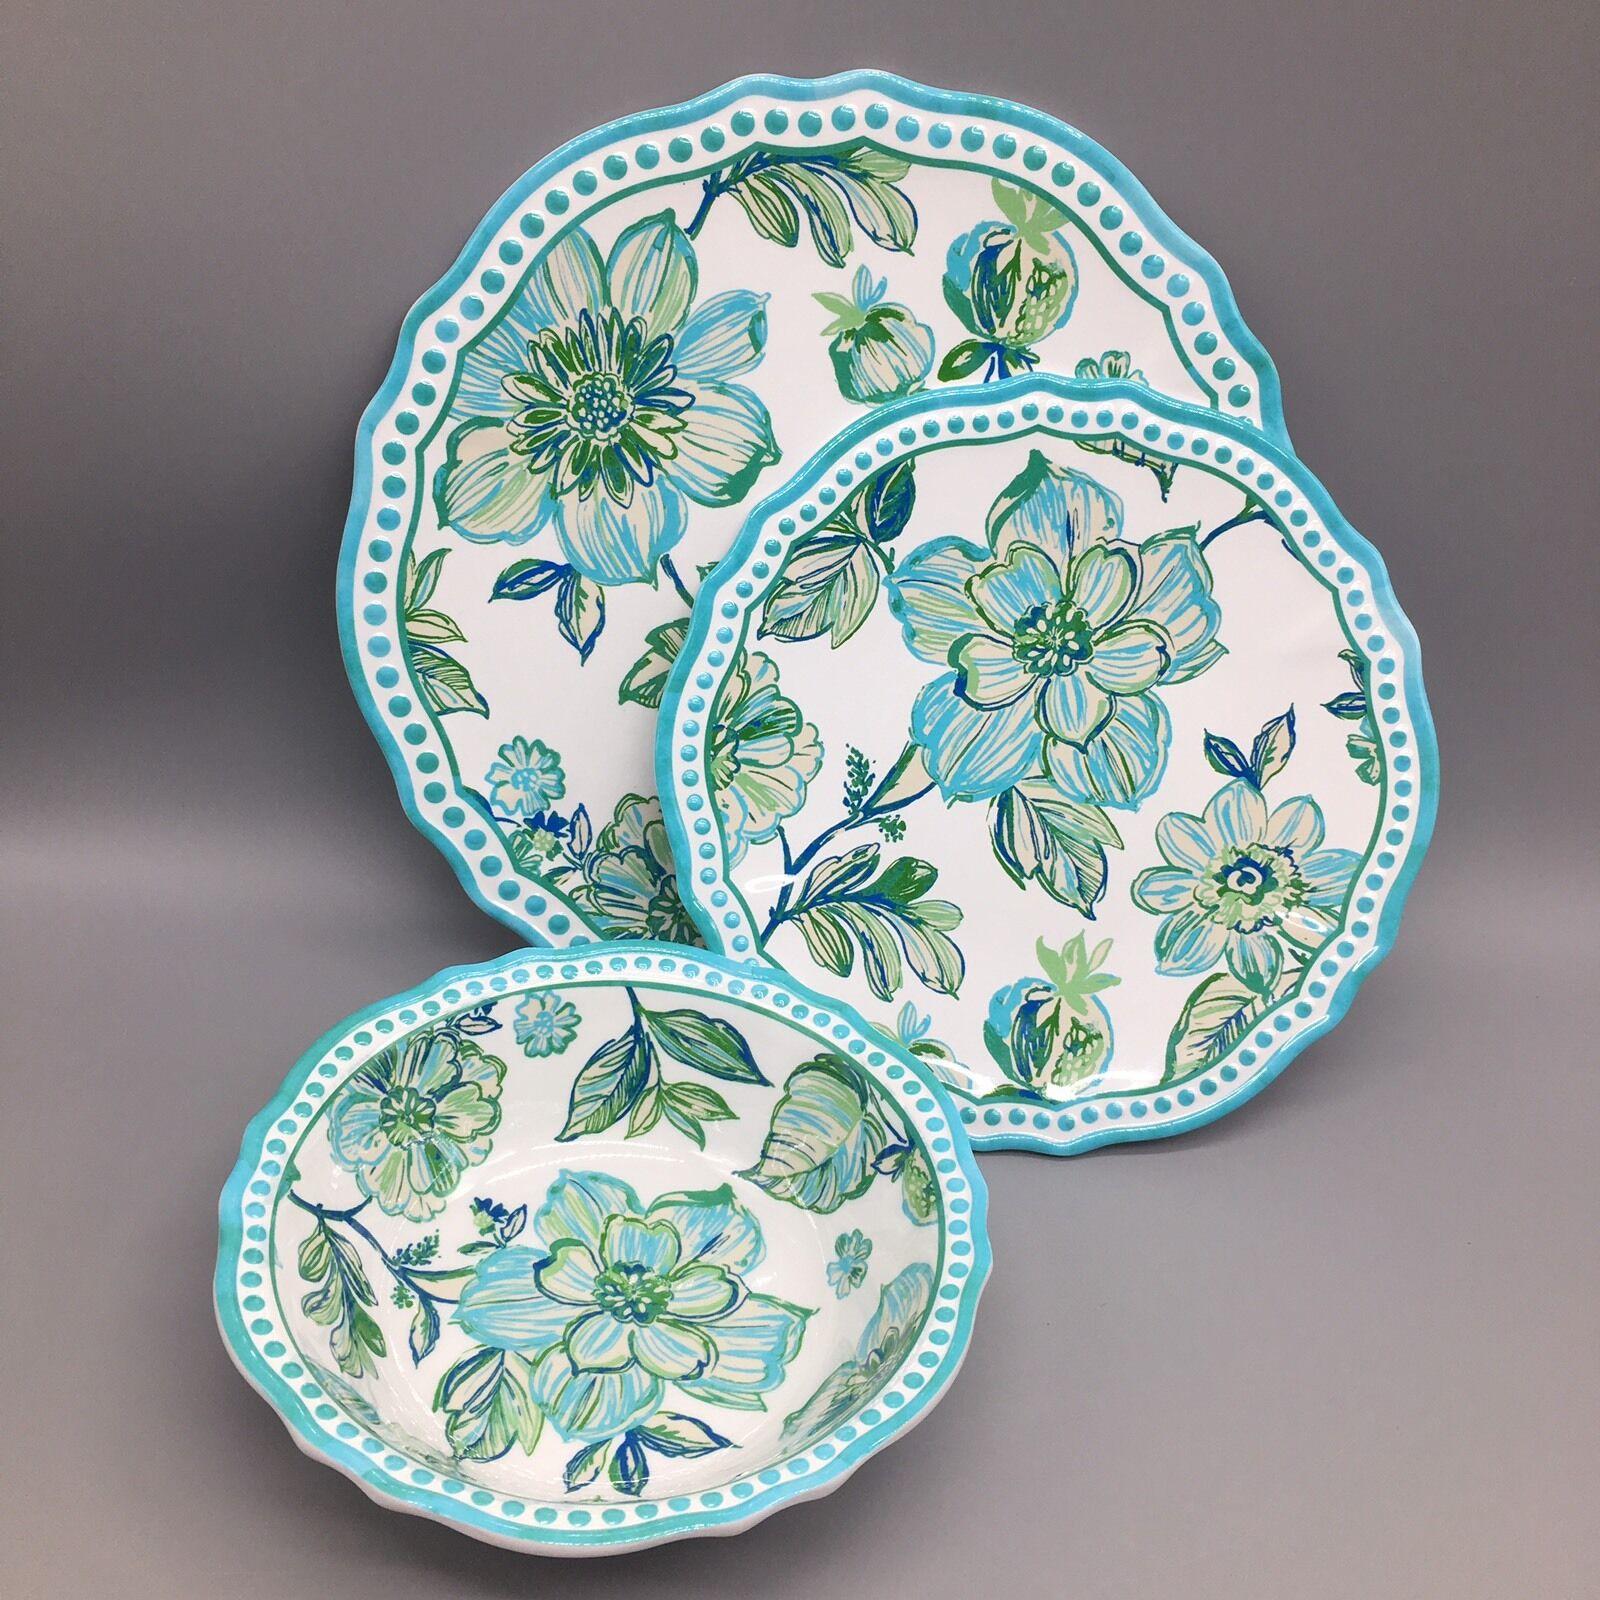 12pc Cynthia Rowley Dîner Assiettes À Salade Bol Set mélamine Sketch Floral Turquoise